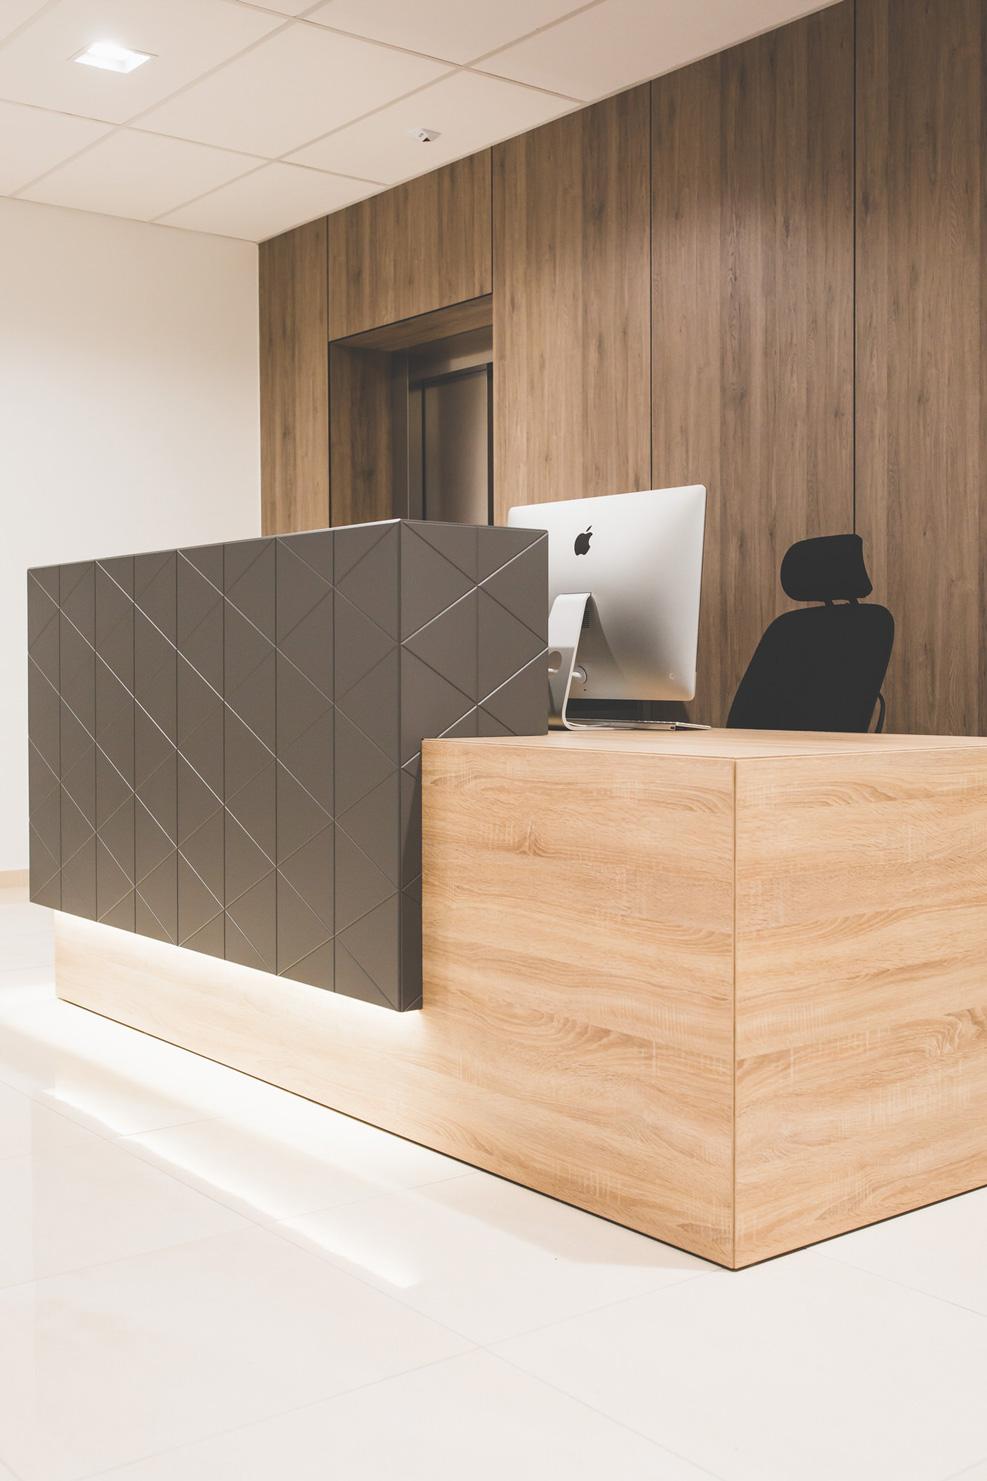 SOFA-SCORE-office-10